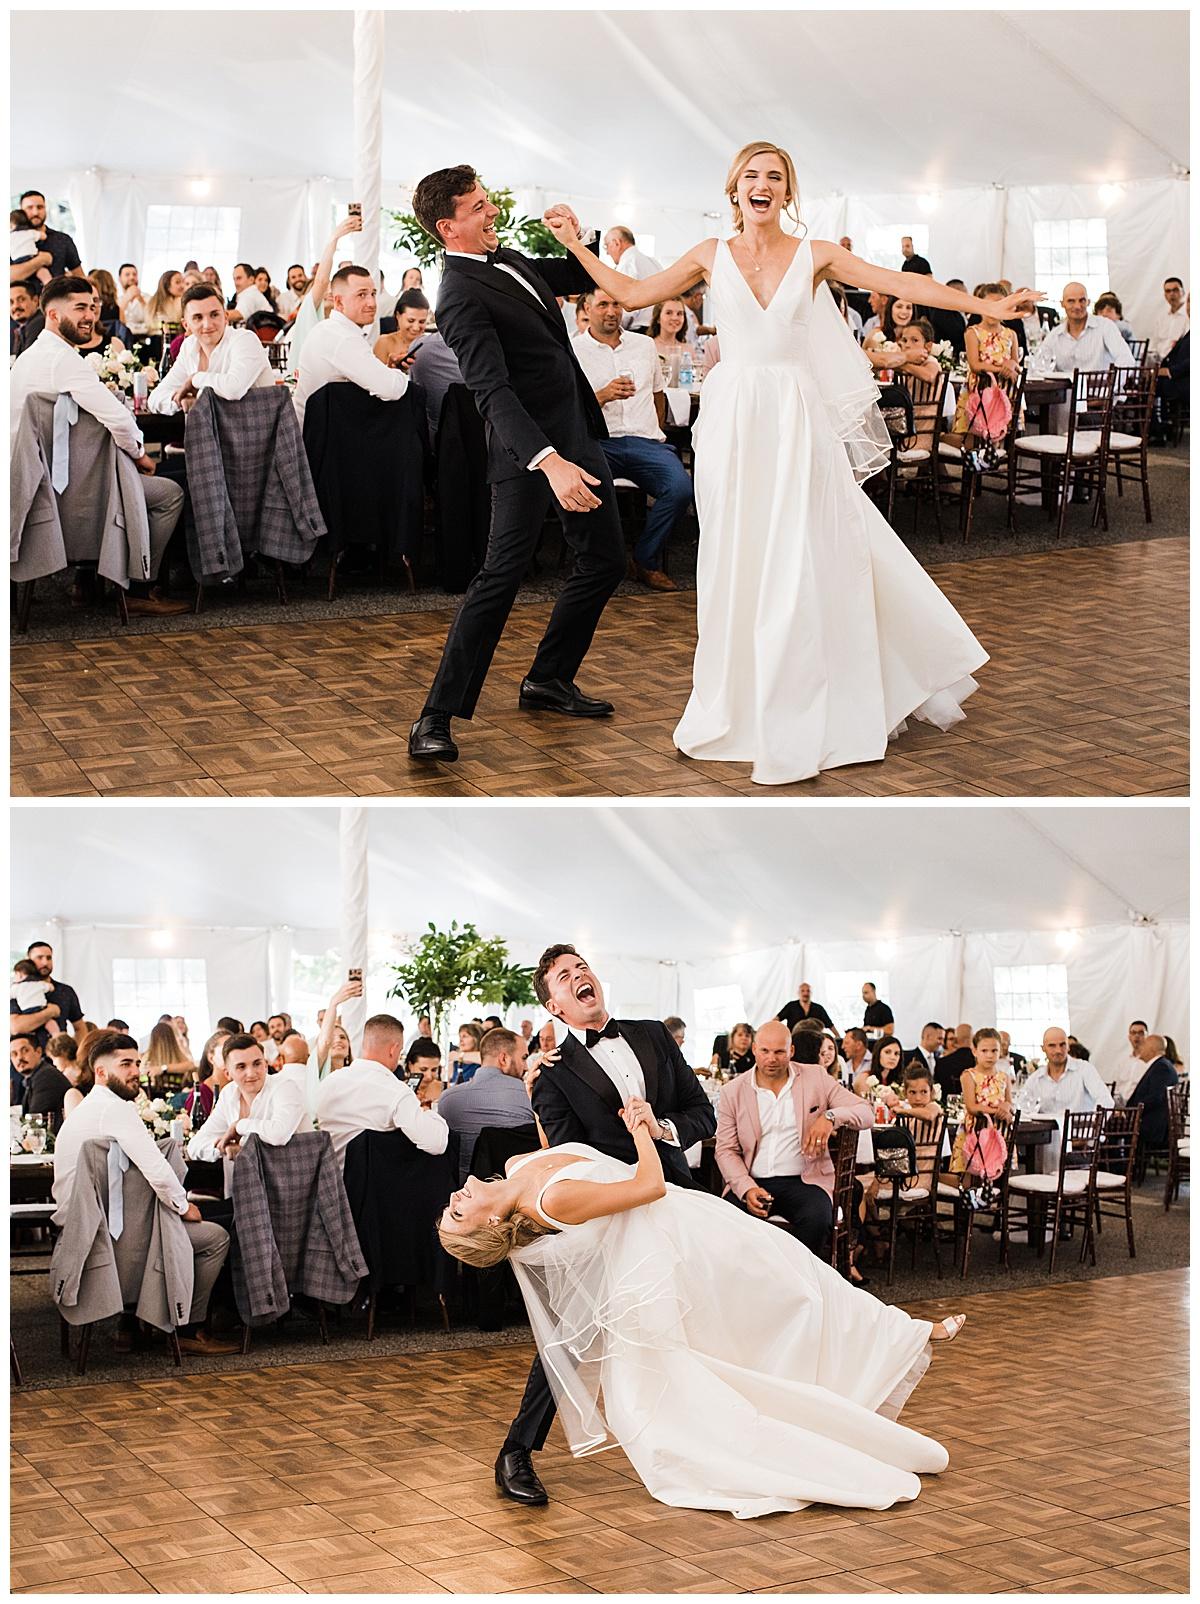 Bride and groom show out on the dance floor  Ontario wedding  Toronto wedding photographer  3photography